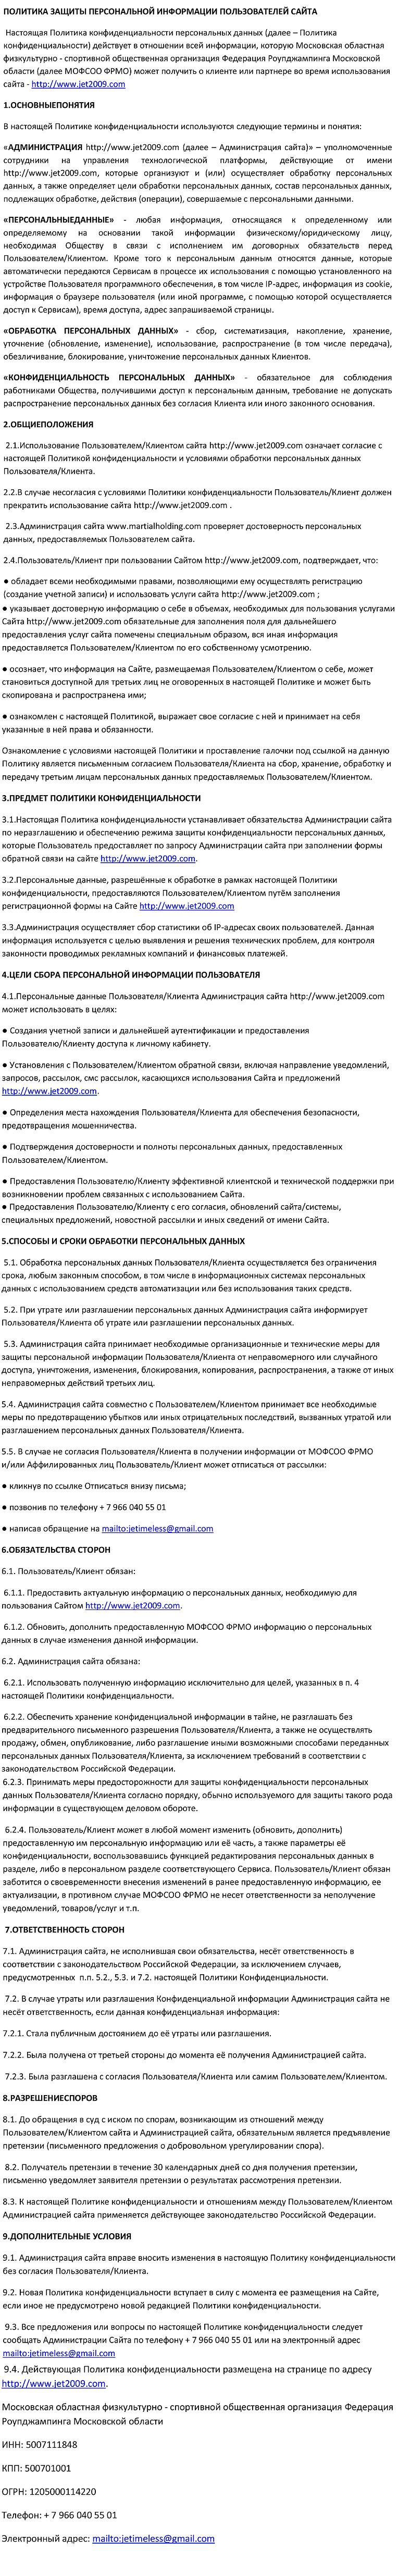 Политика Конфиденциальности.jpg